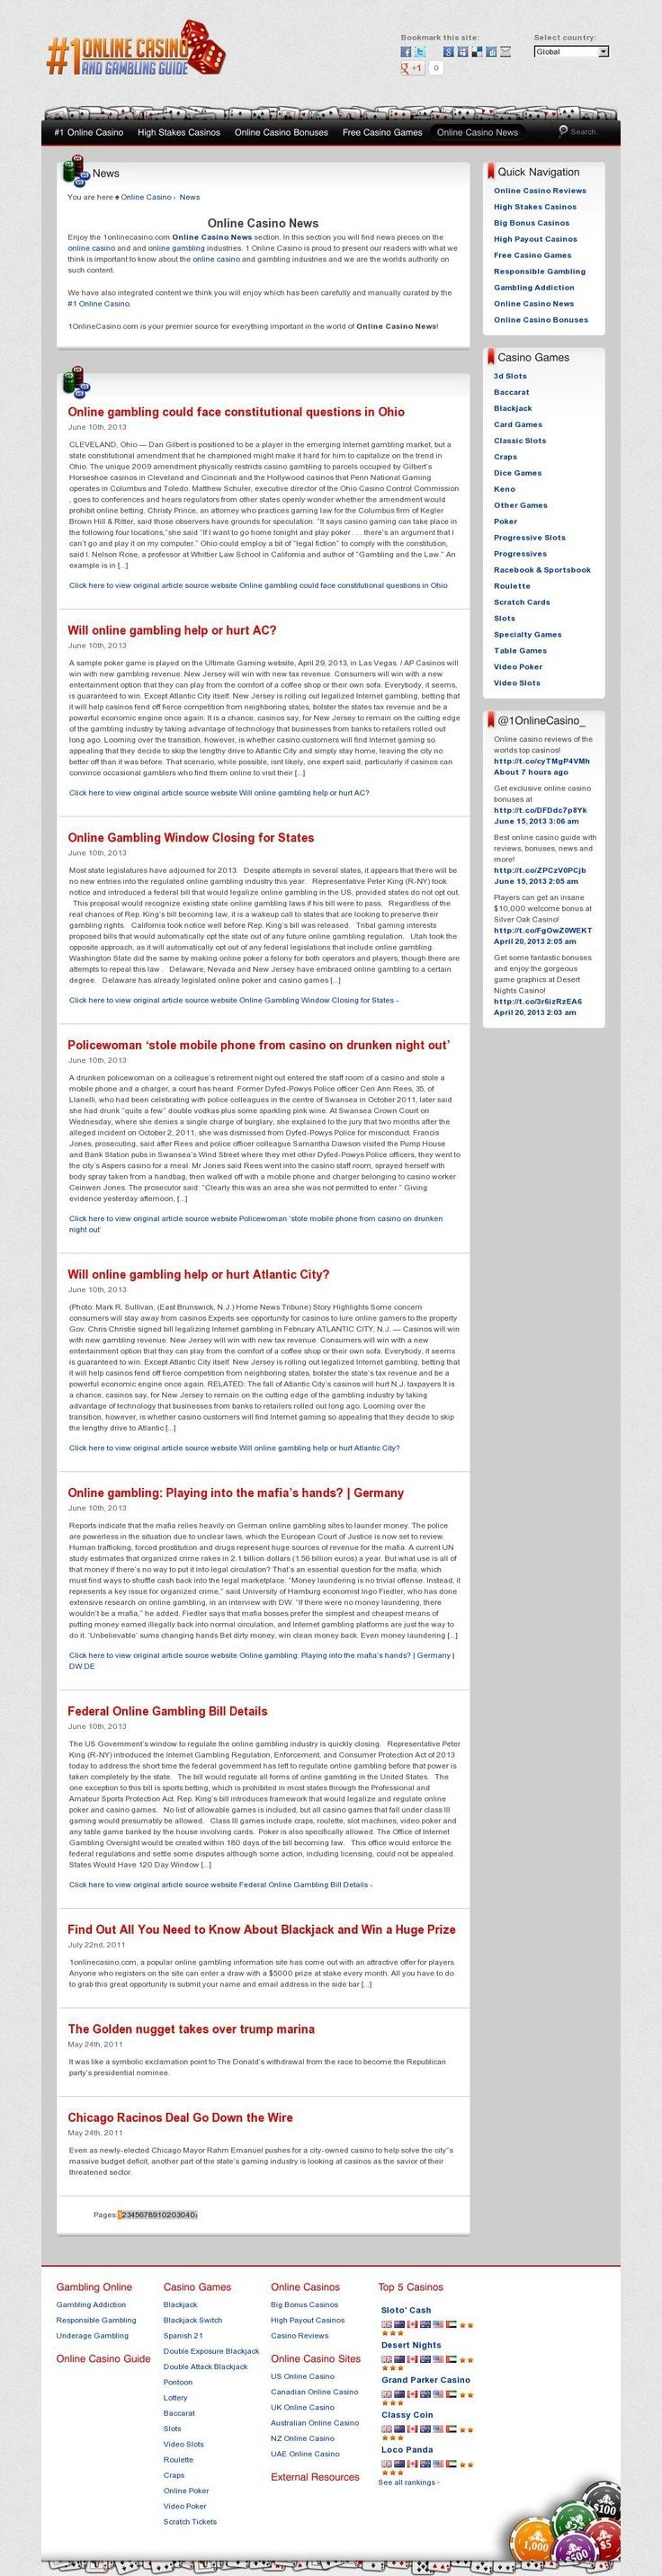 Online Casino News from 1onlinecasino.com